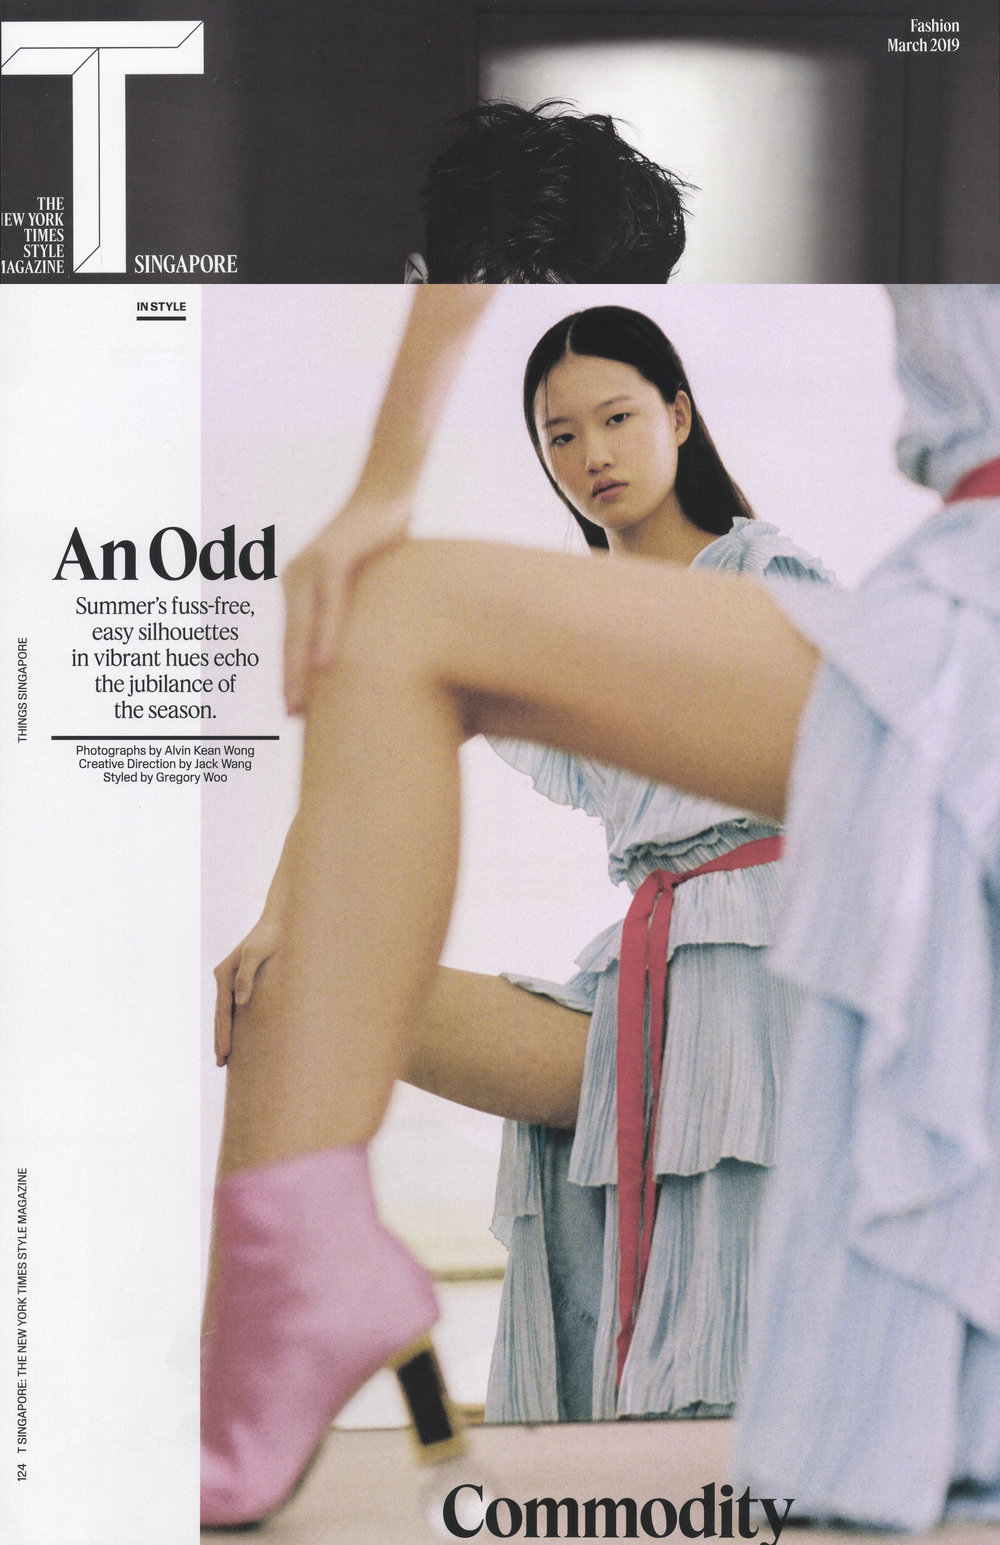 Singapore_T Magazine_March DVF.jpg